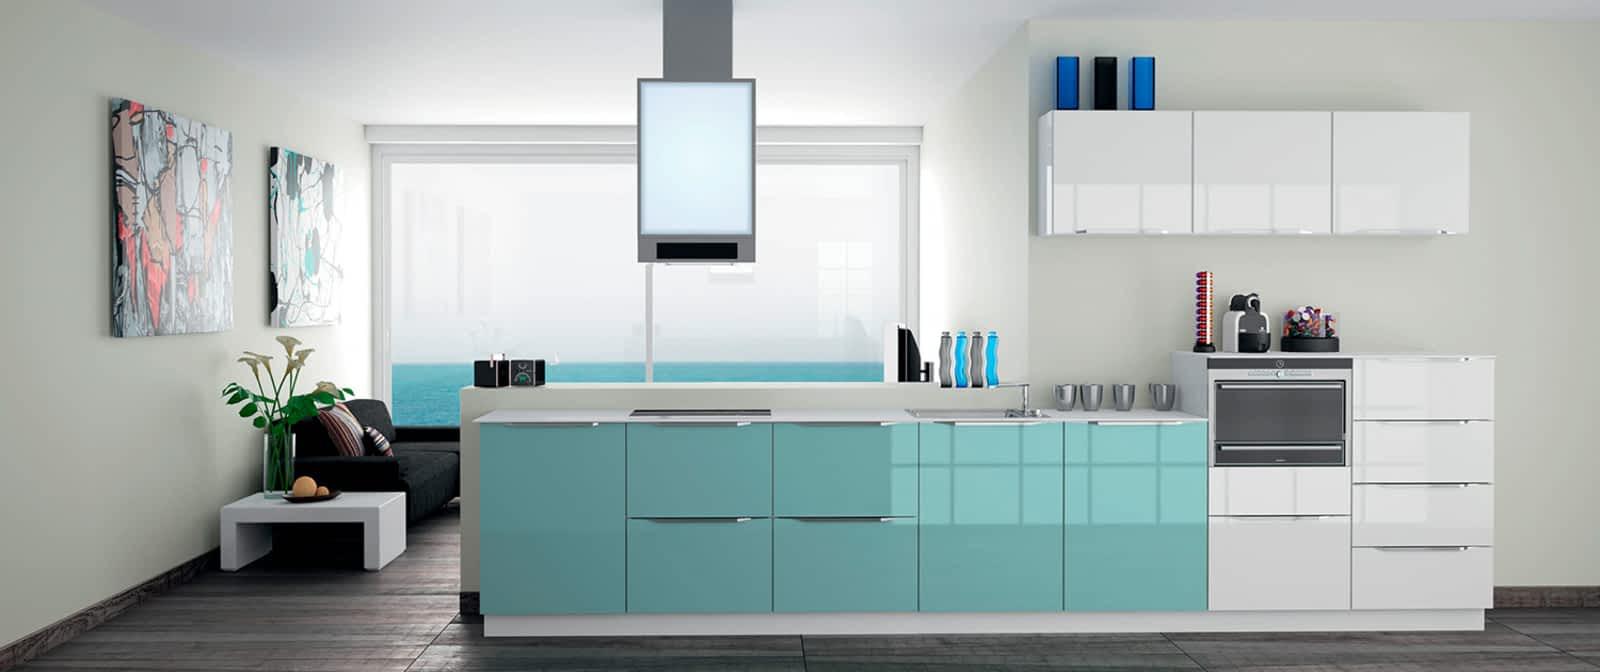 Luminous Cabinets Ltd - Opening Hours - Burnaby, BC